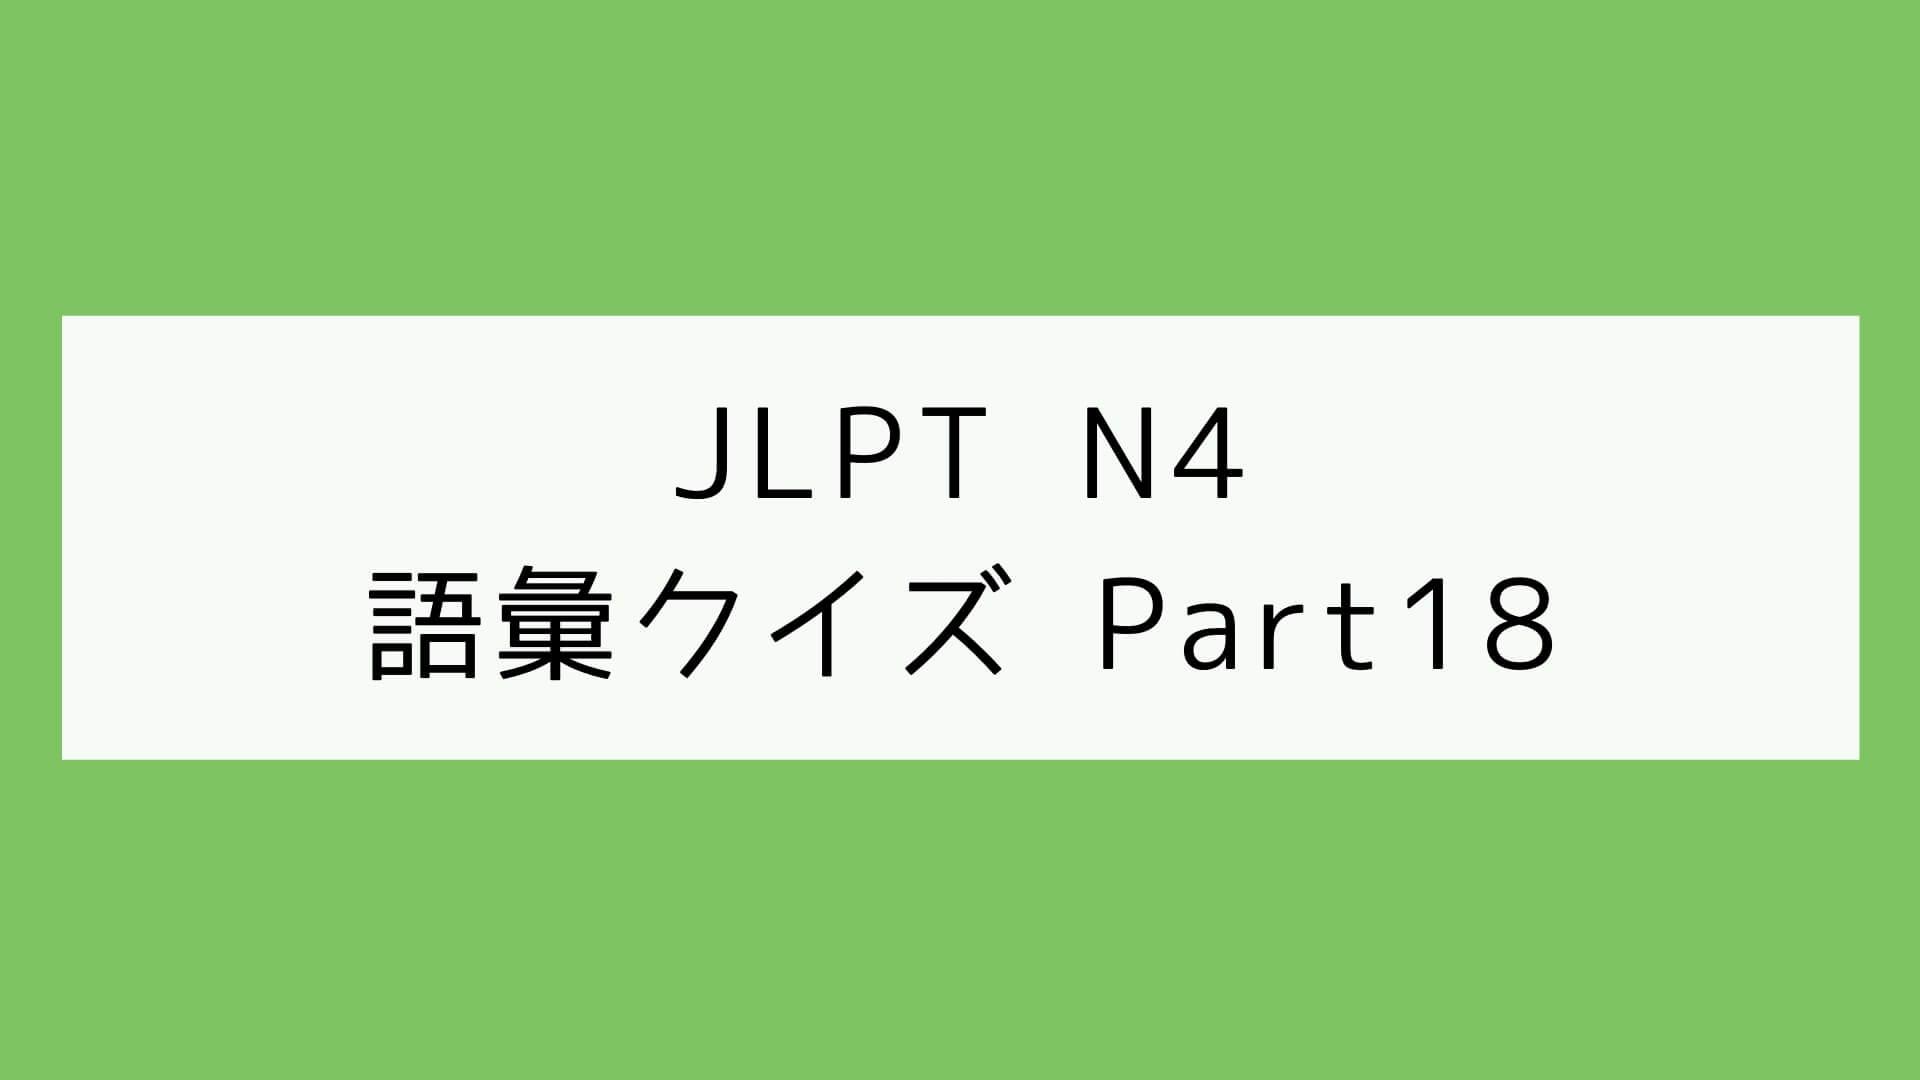 【JLPT N4】語彙クイズ Part18